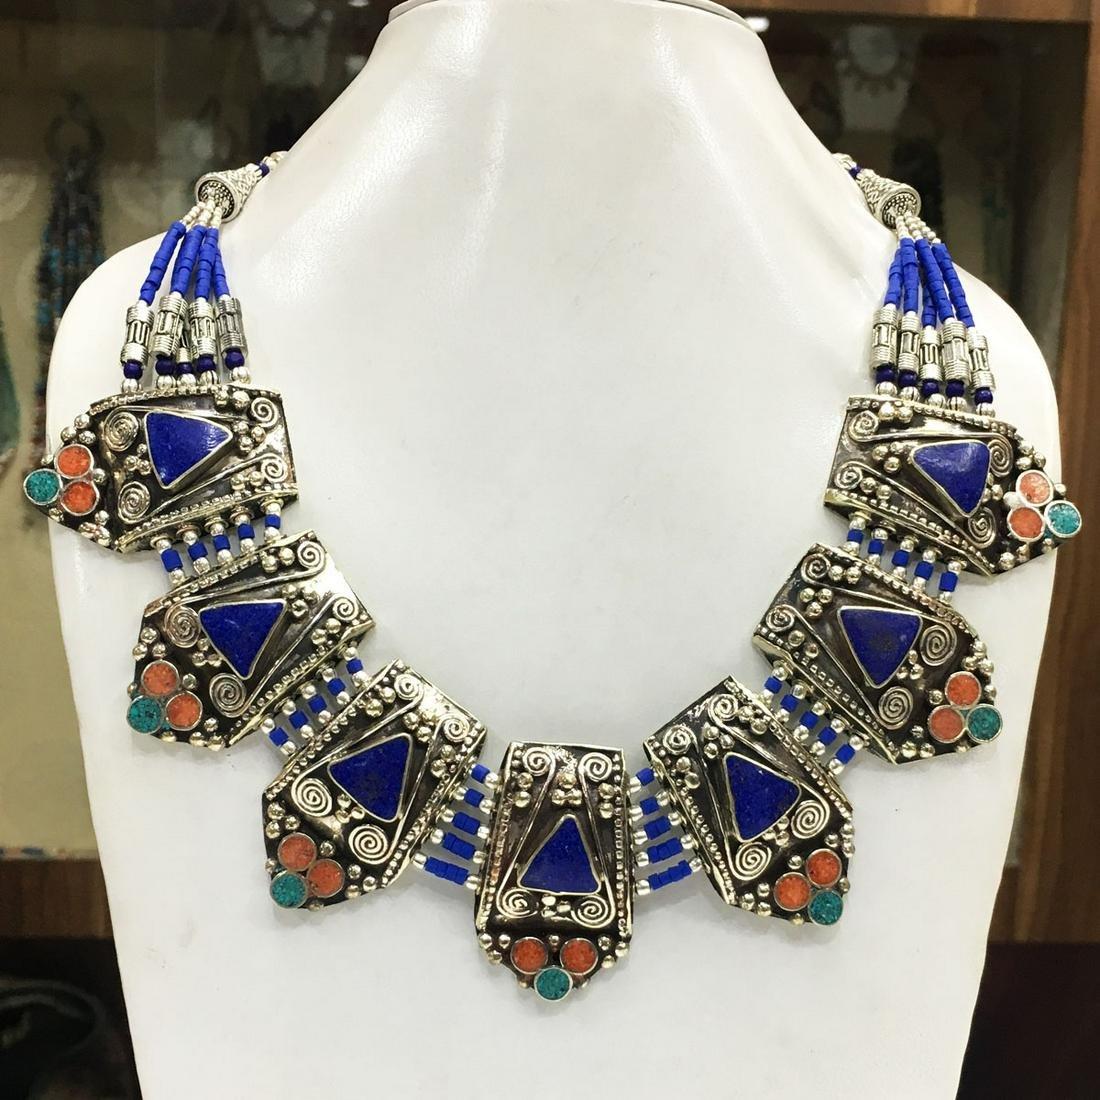 Women's Old Vintage Lapis Tibetan Asian Necklace